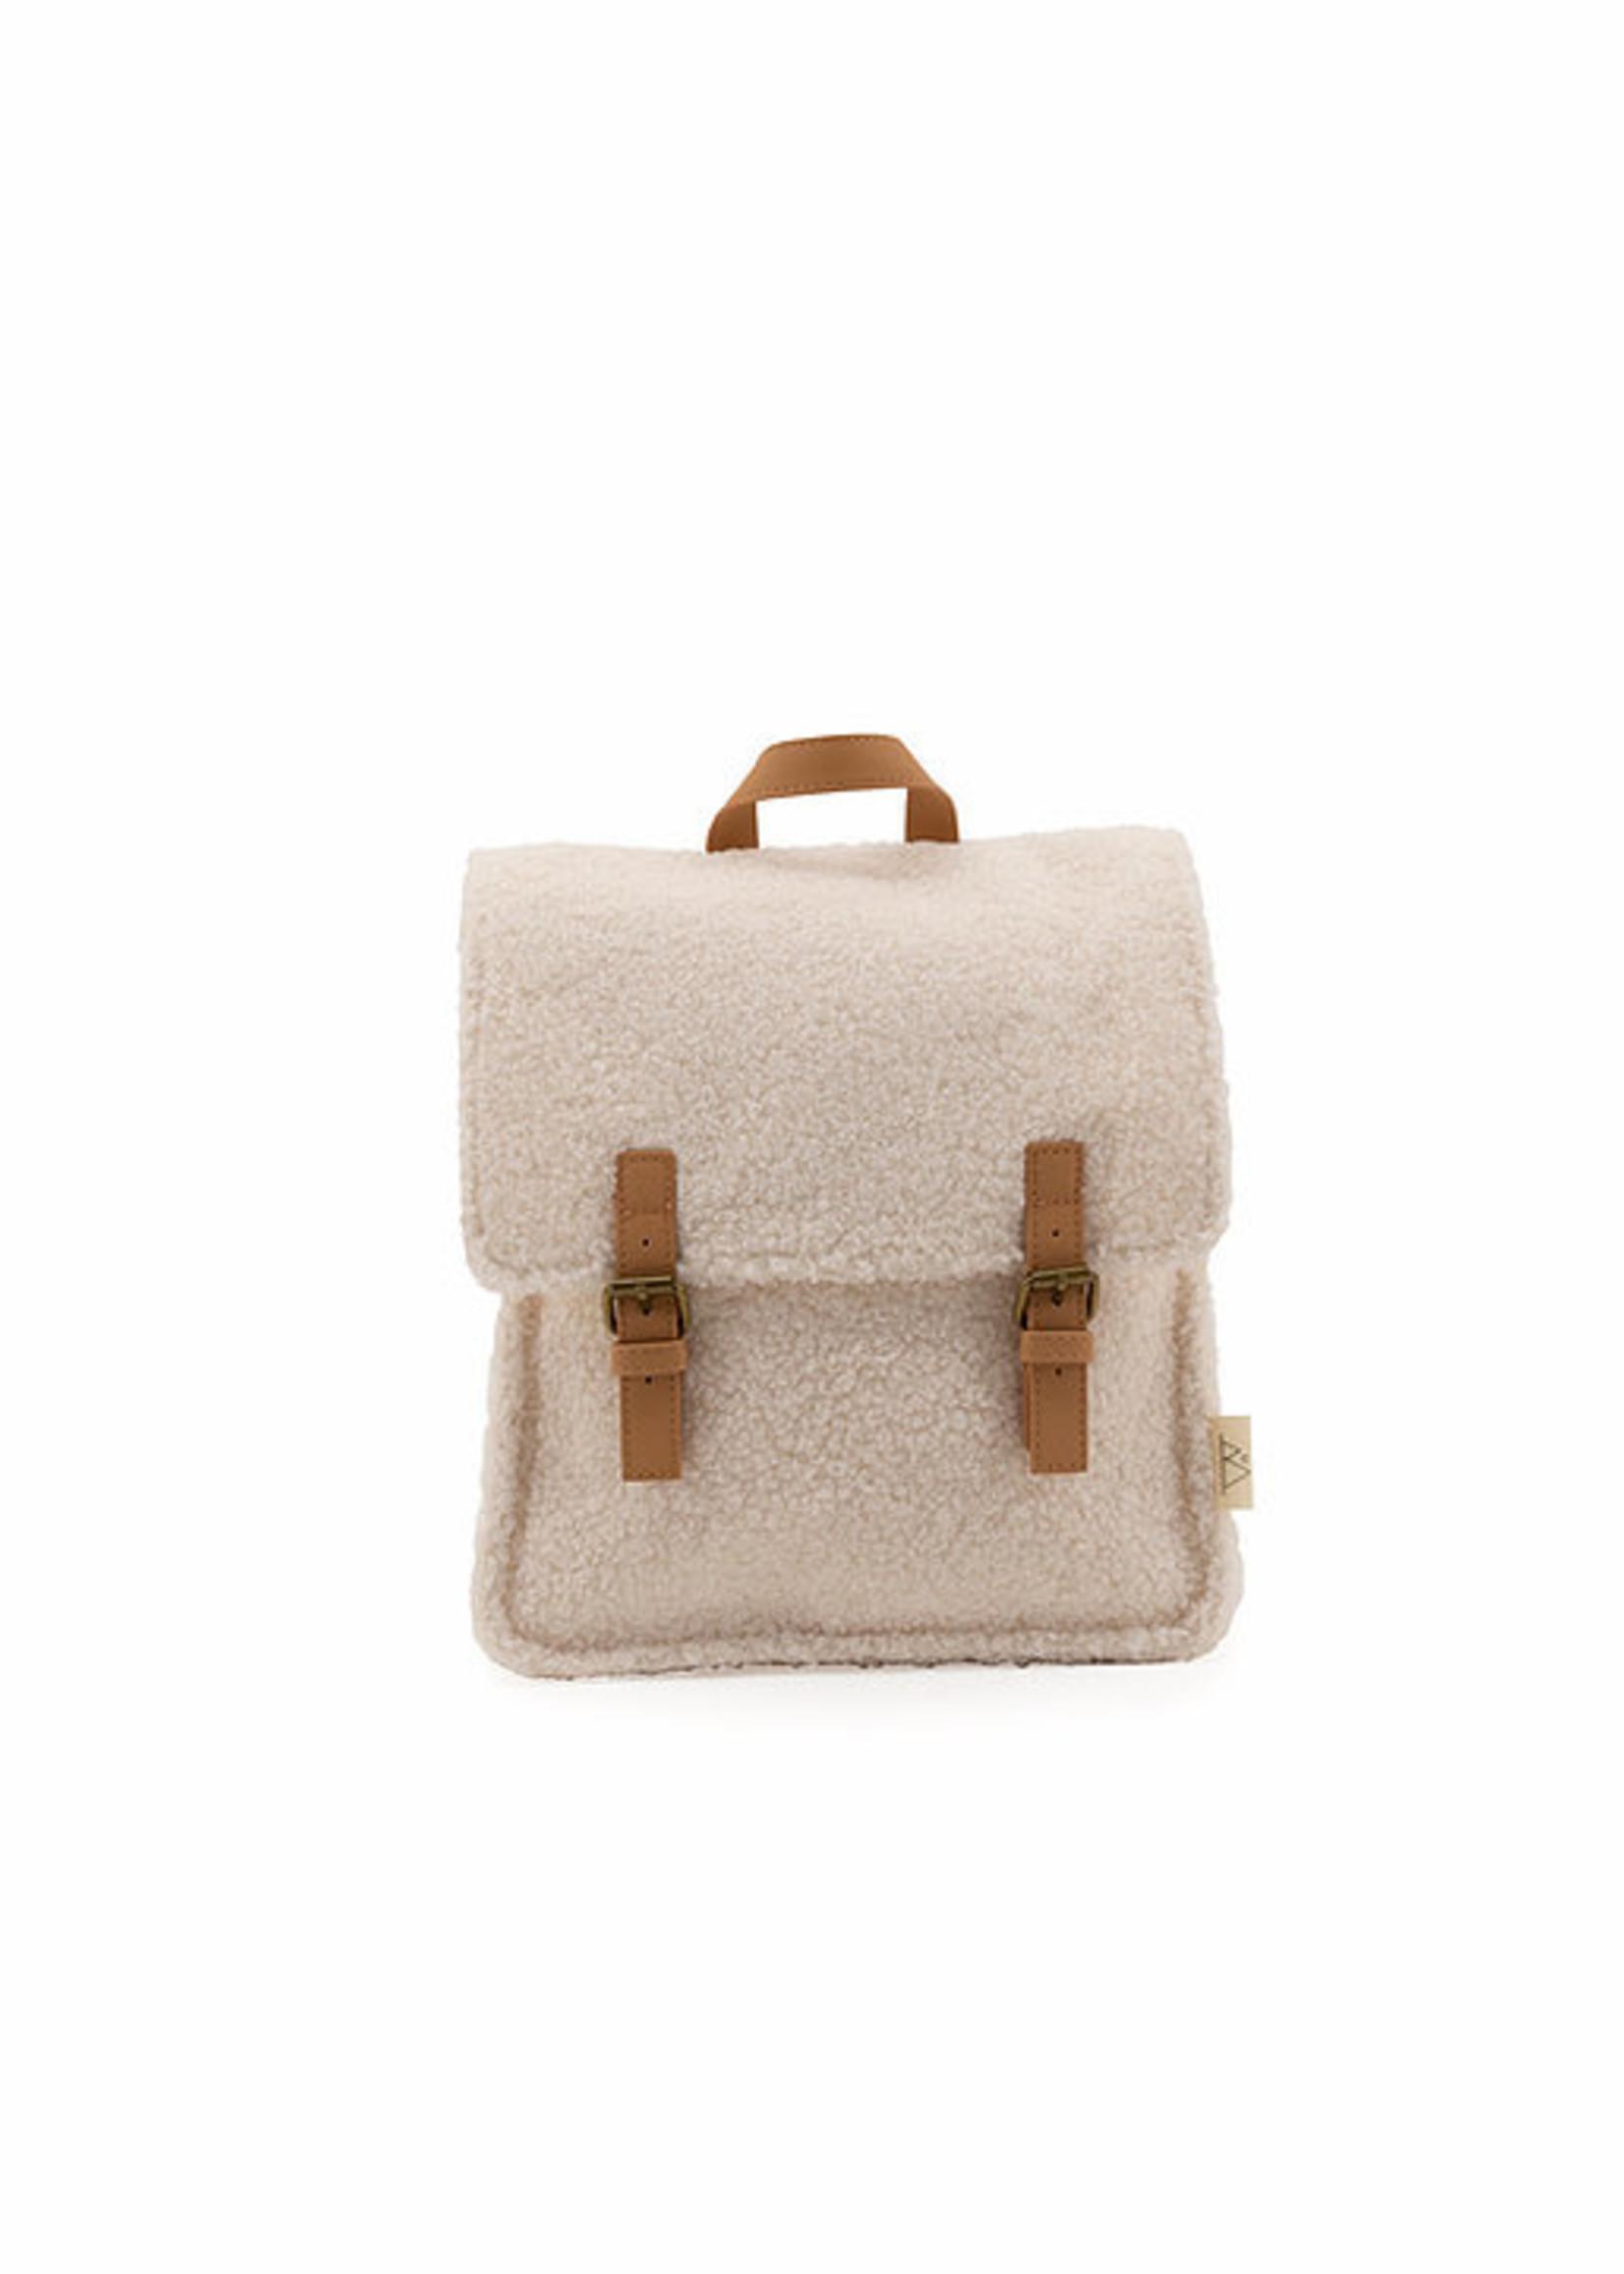 Nanami - Teddy Backpack Off-white